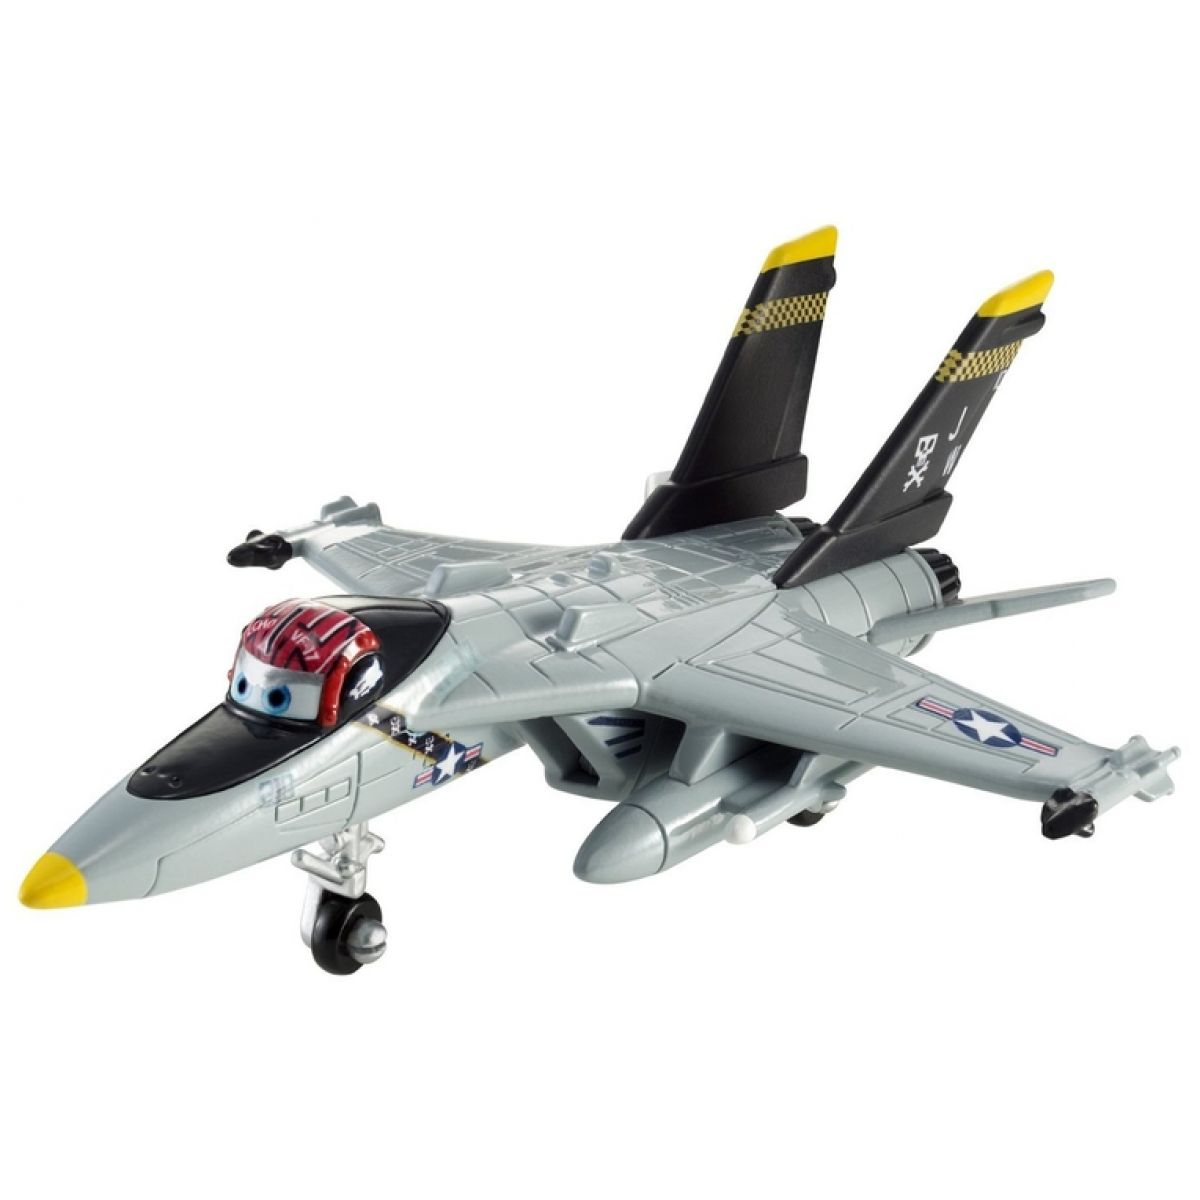 Mattel Planes Letadla X9459 - Echo